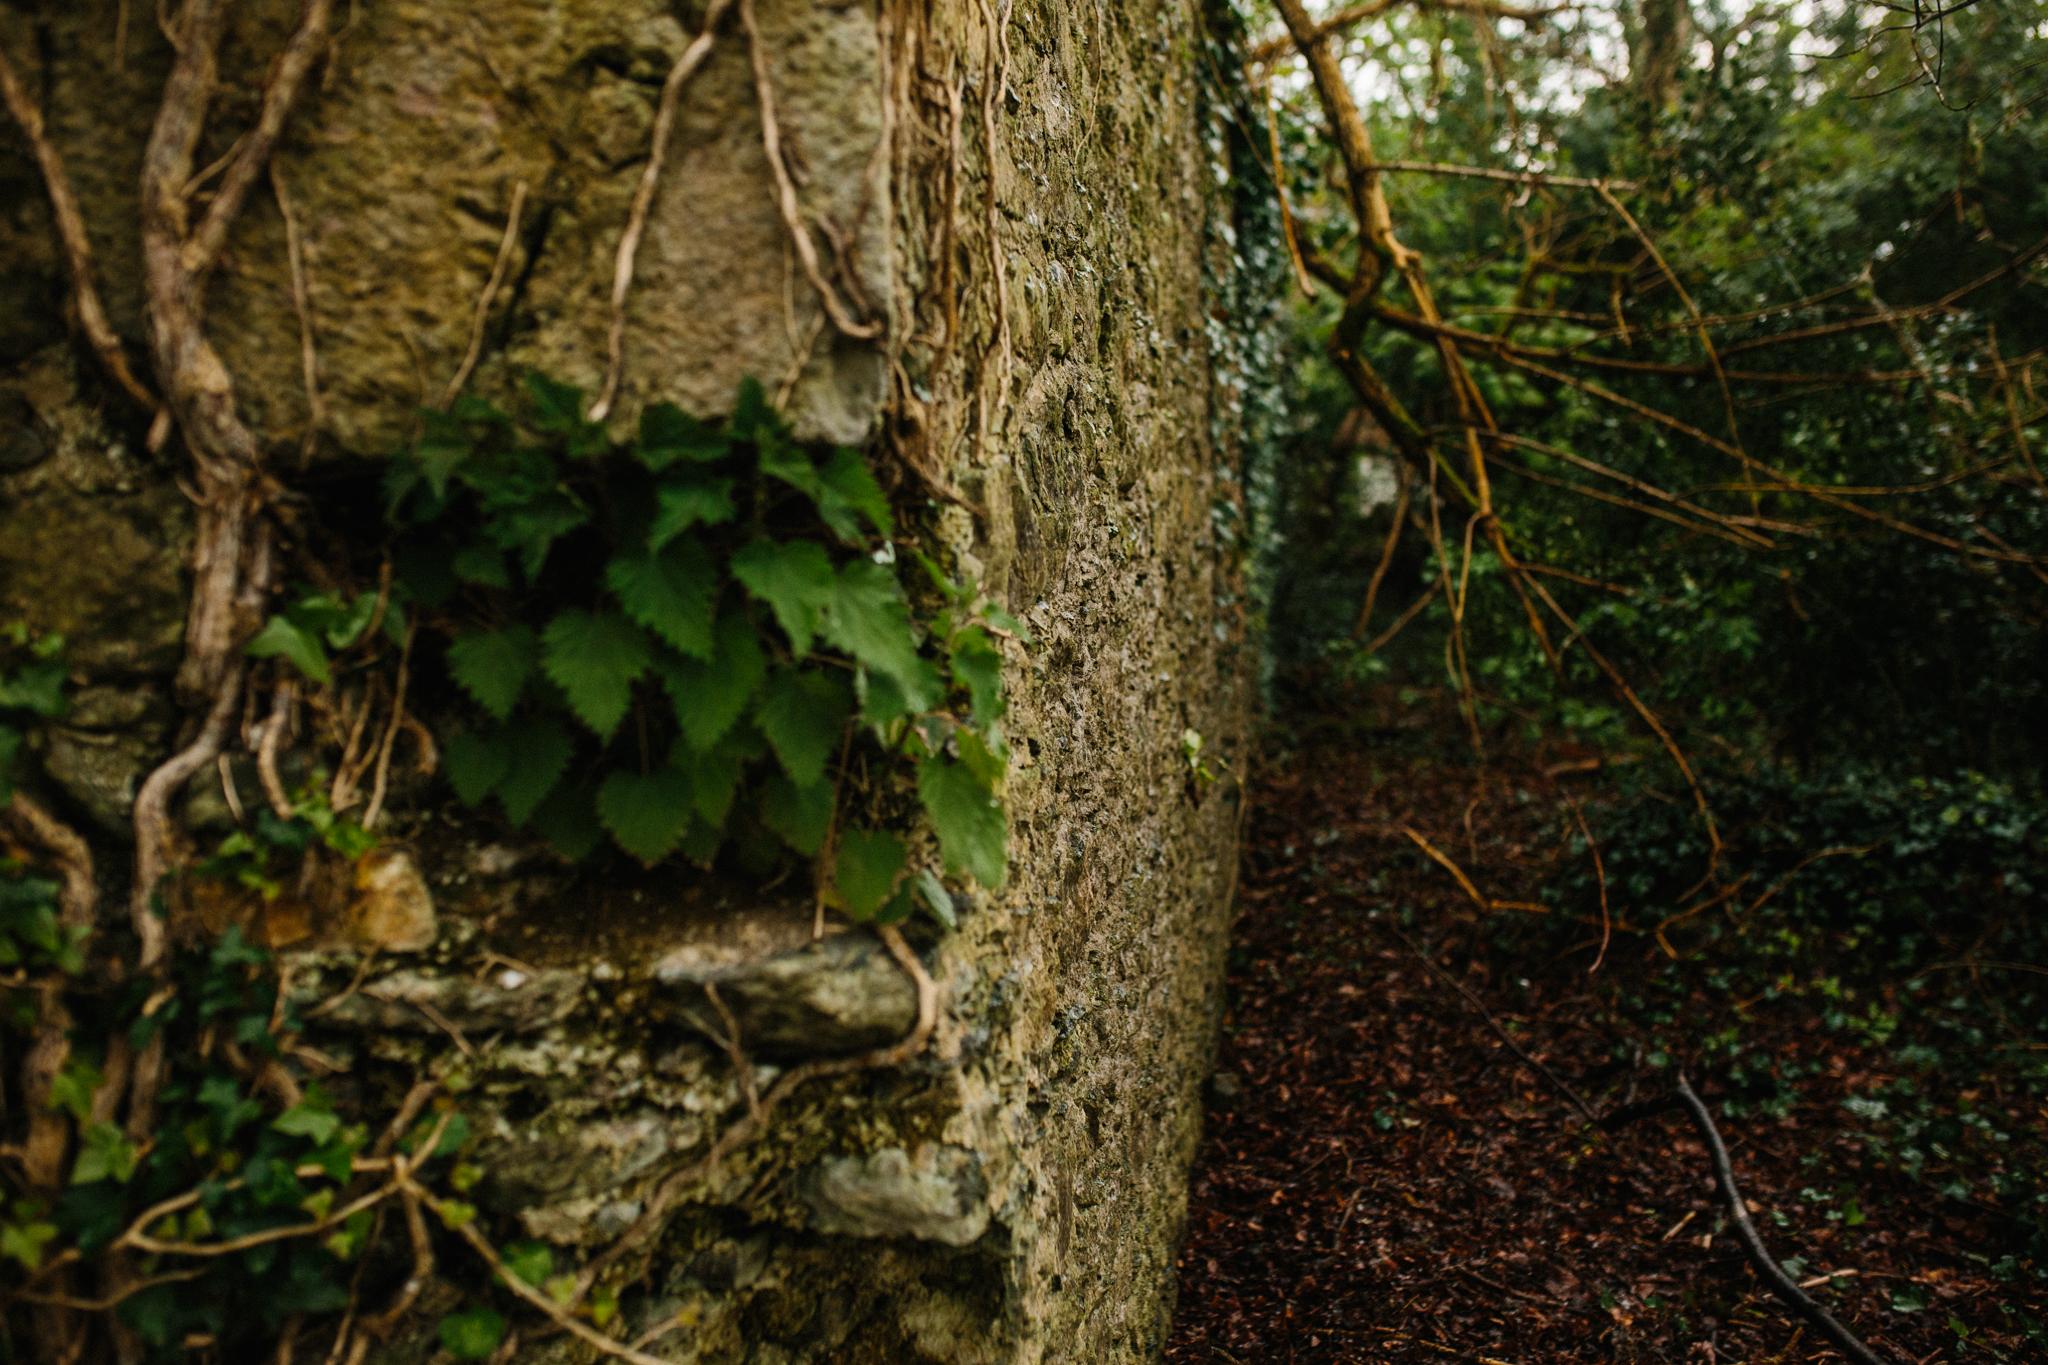 ireland_galway_dublin_rebecca_burt_photography-66.jpg